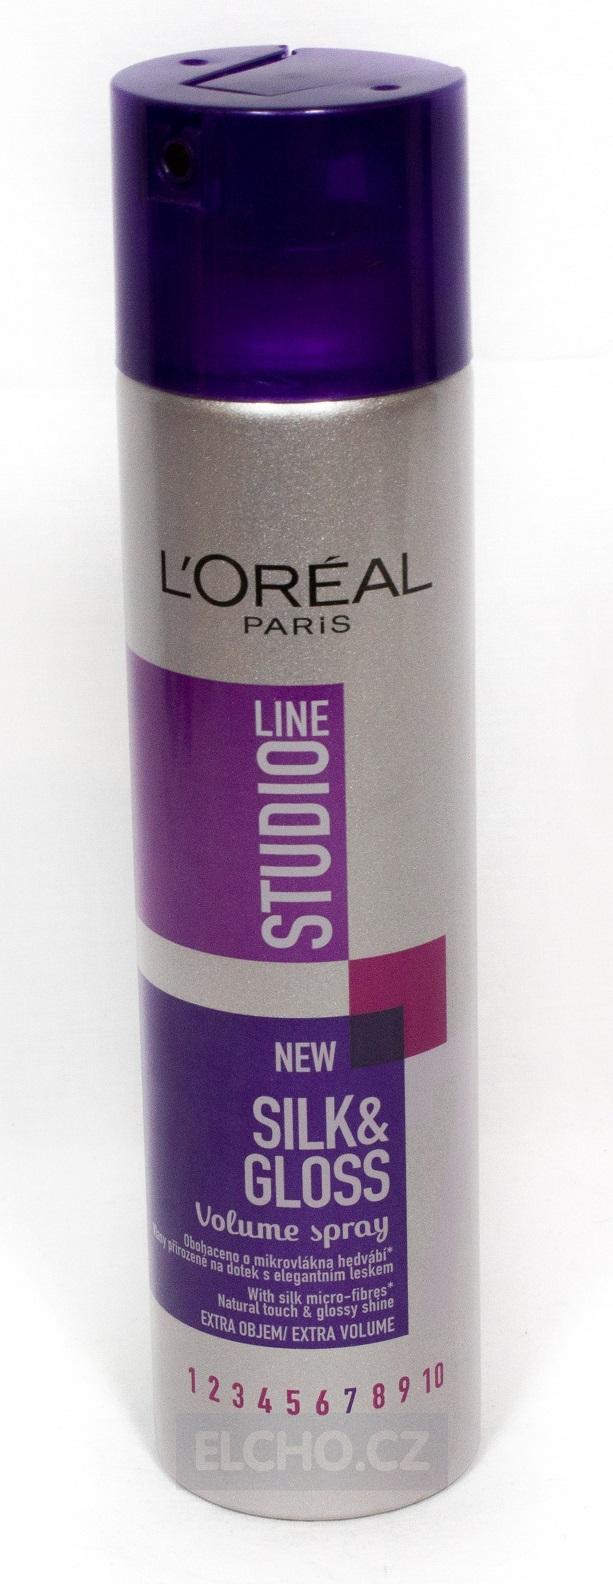 LOREAL STUDIO Silk&Gloss lak na vlasy 250ml